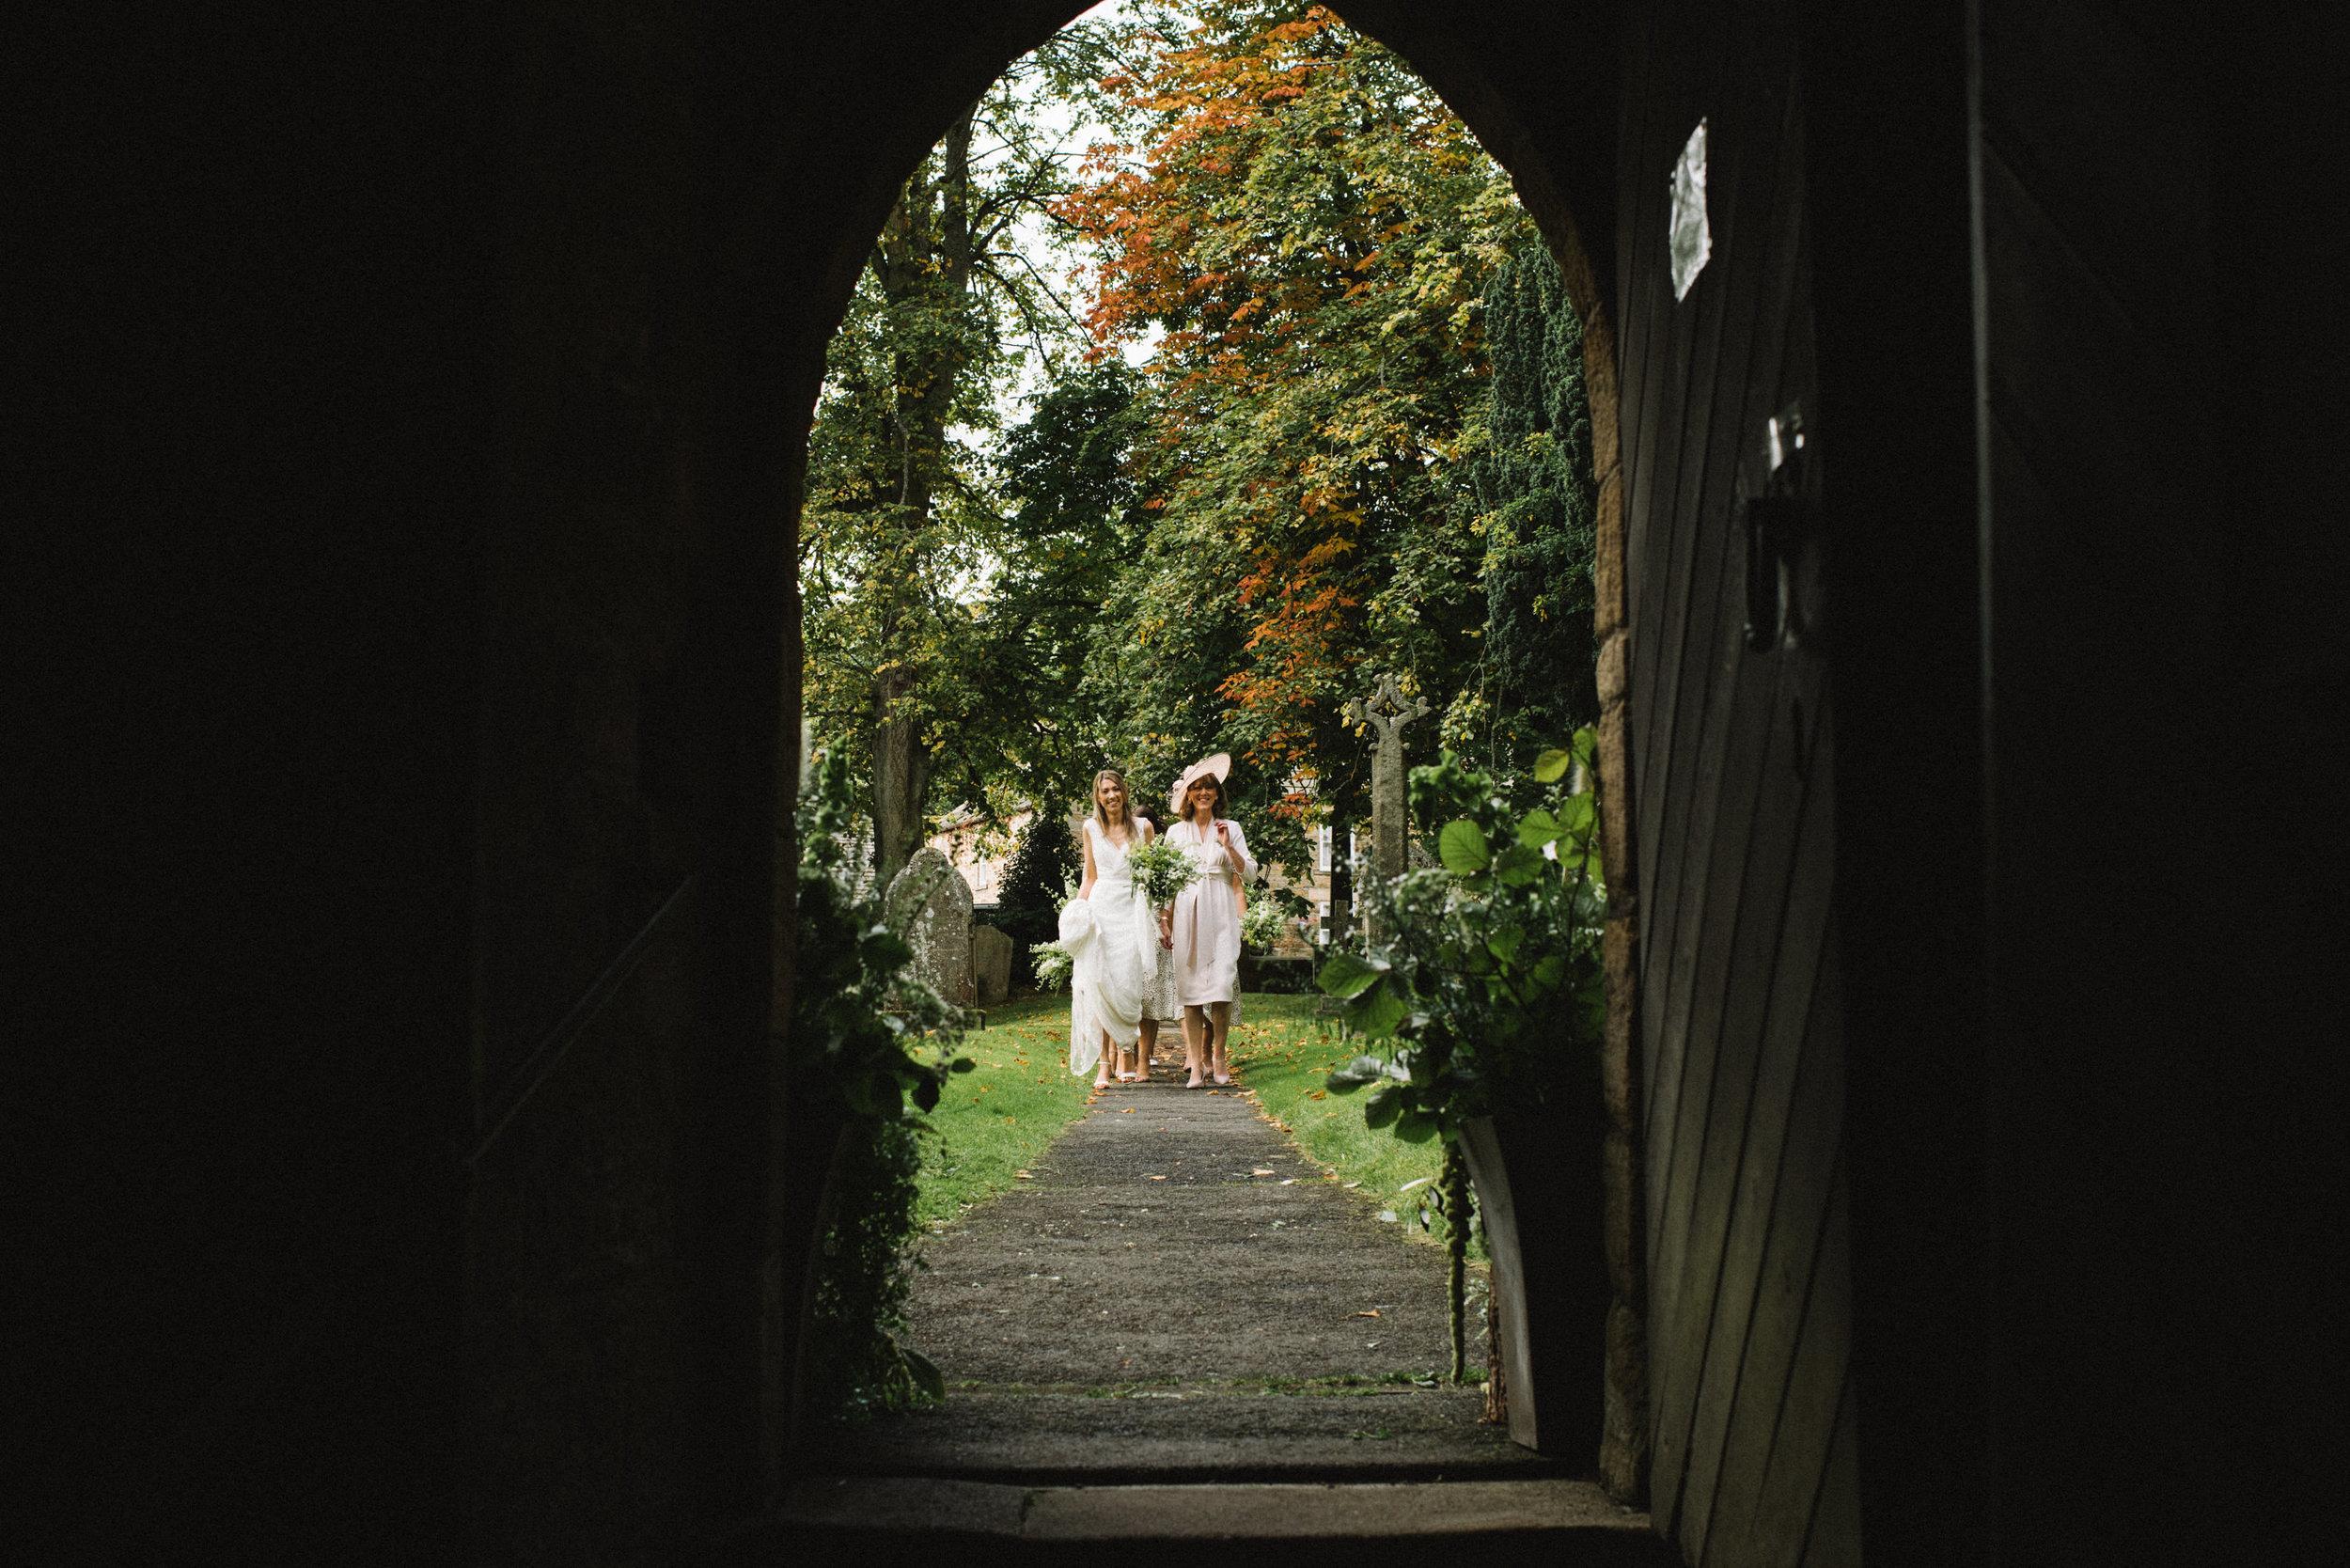 0211-LISA-DEVINE-PHOTOGRAPHY-ALTERNATIVE-WEDDING-PHOTOGRAPHY-SCOTLAND-DESTINATION-WEDDINGS-GLASGOW-WEDDINGS-COOL-WEDDINGS-STYLISH-WEDDINGS.JPG